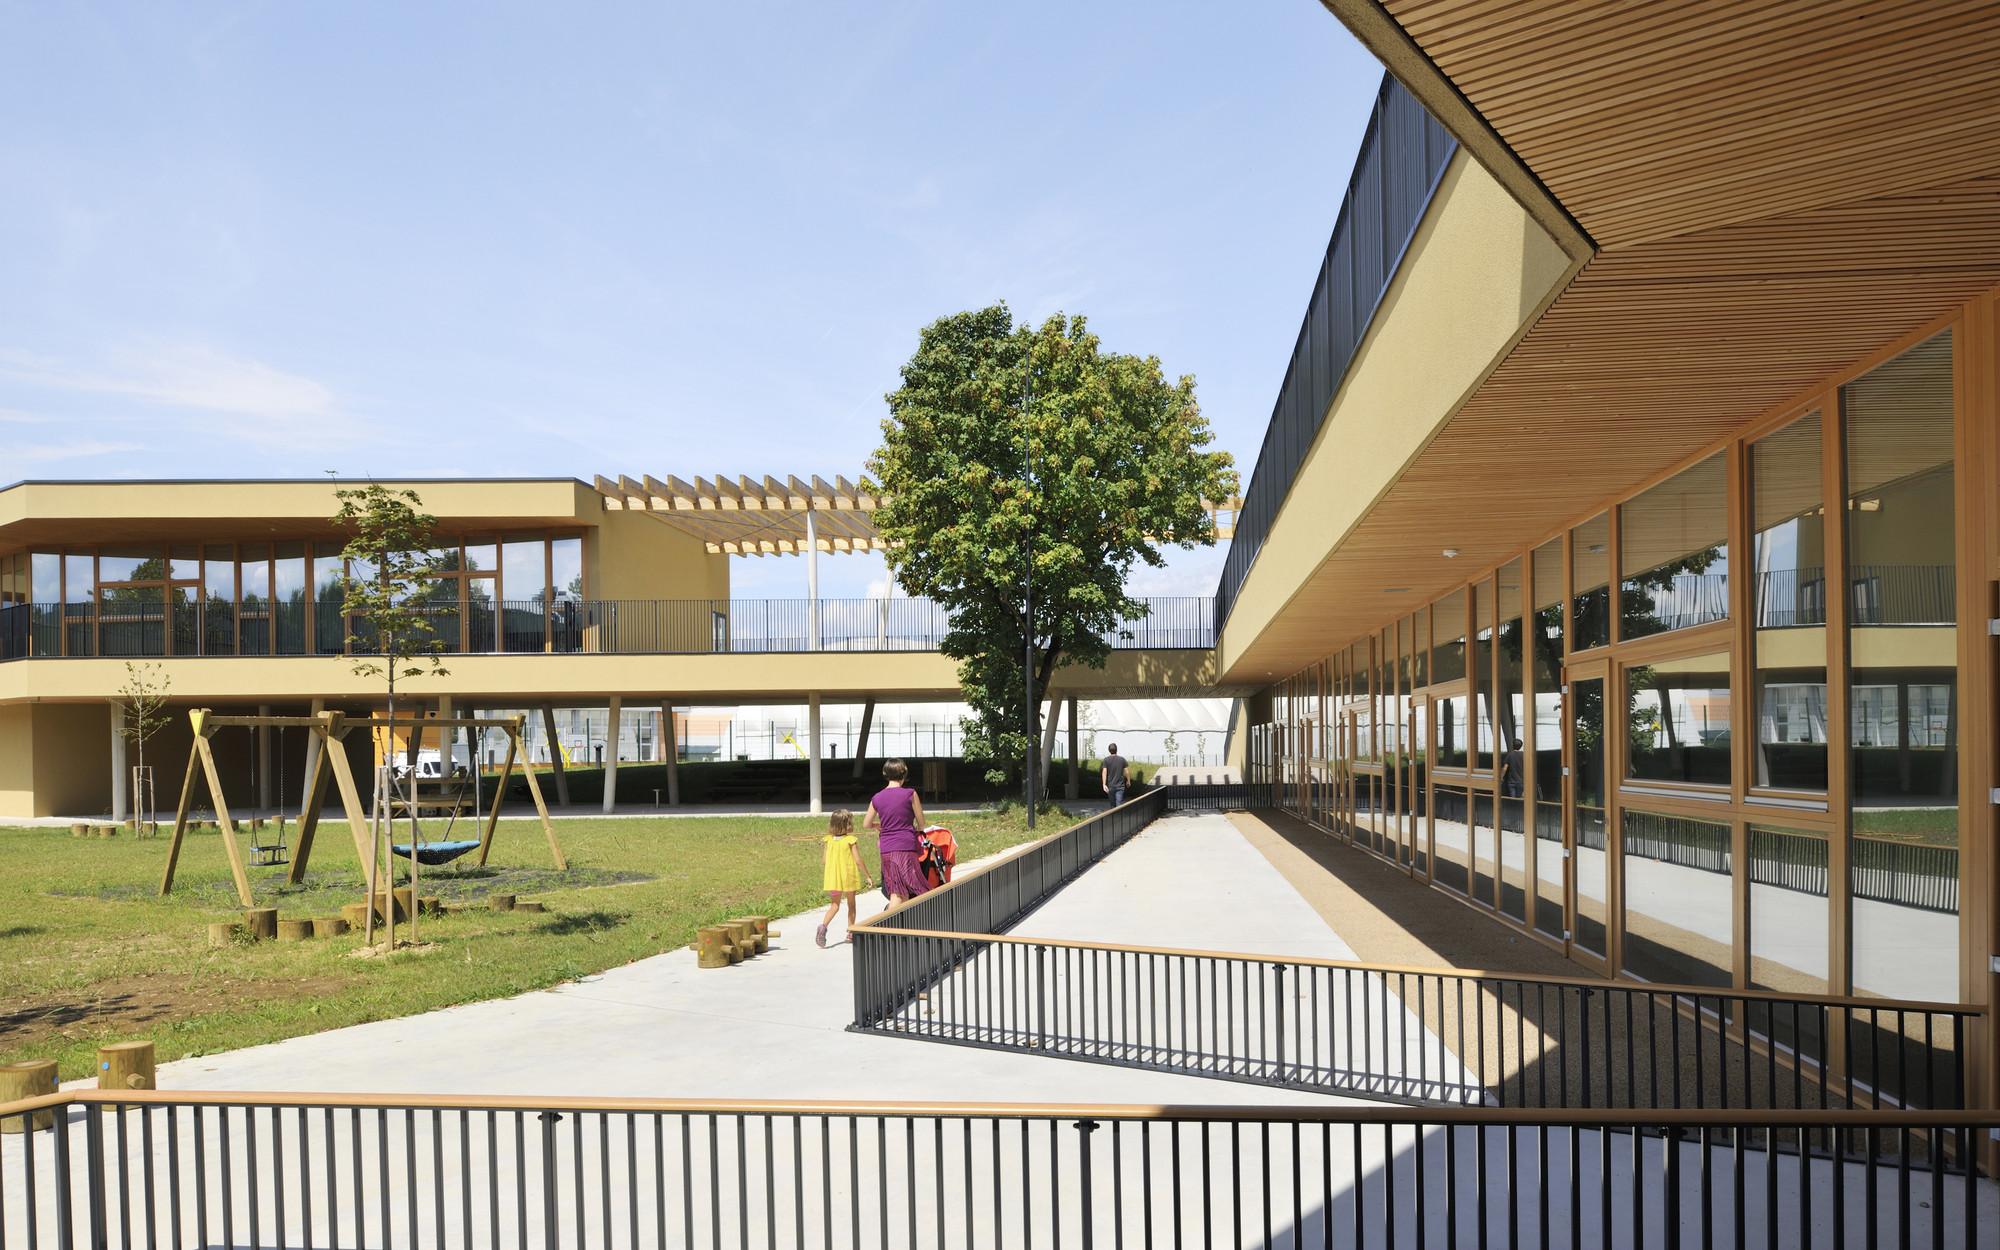 Kinder Garden: Kindergarten Mavrica / Breda Bizjak (BB Arhitekti), Lidija